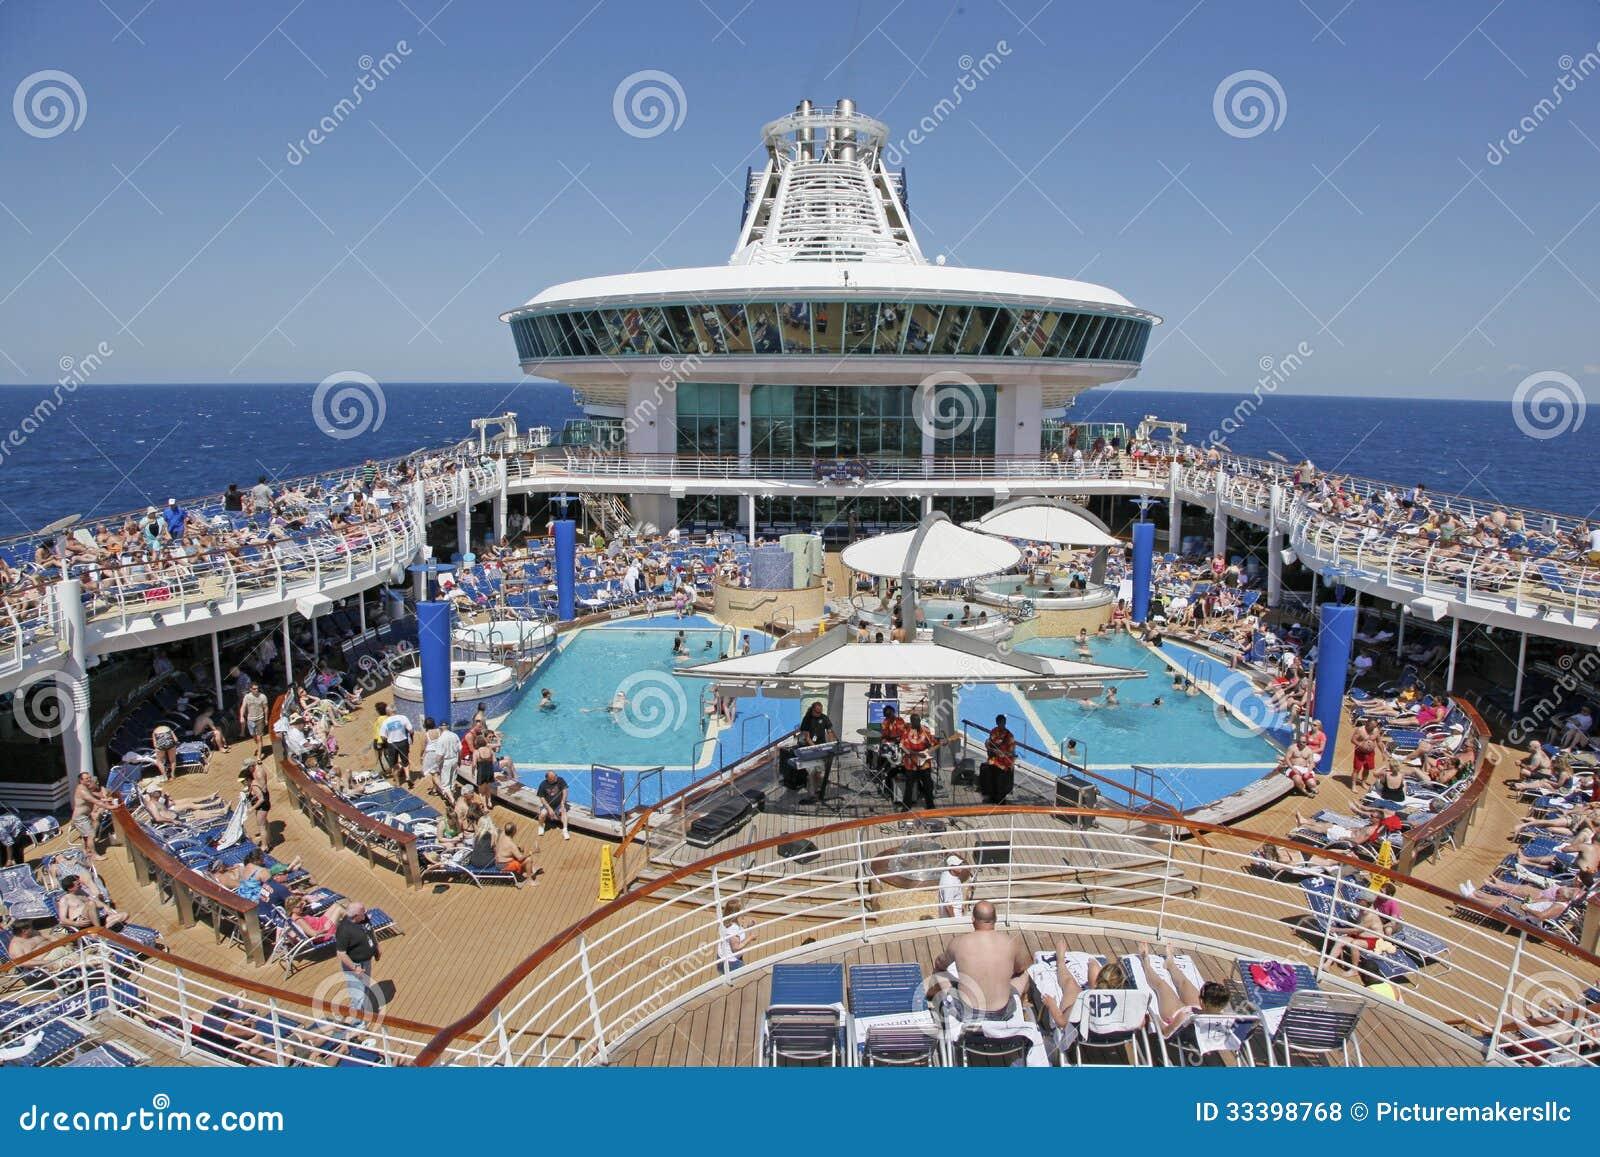 Cruise Ship At Sea Editorial Stock Photo Image 33398768